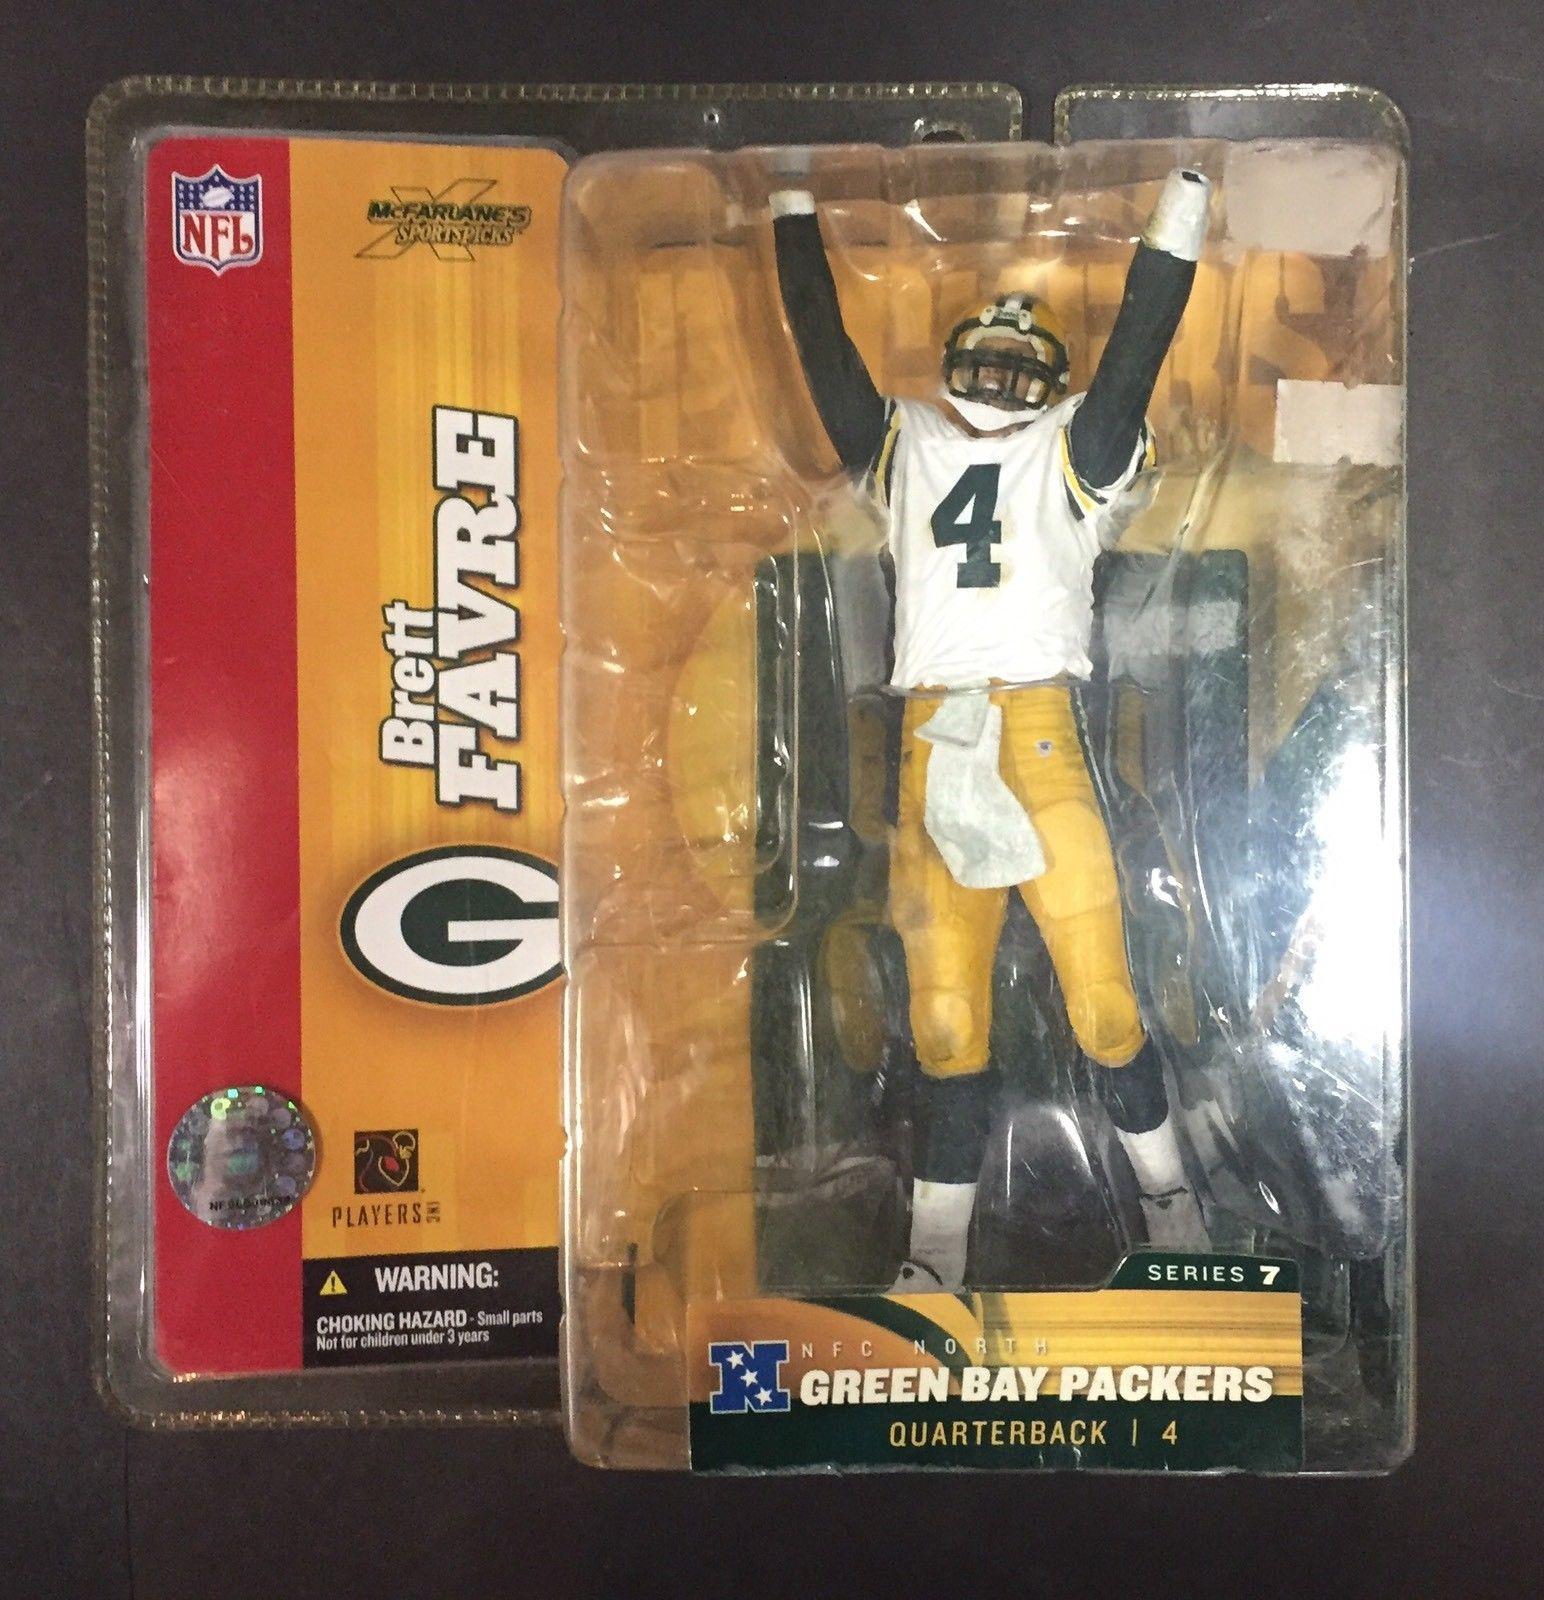 McFarlane NFL Brett Favre Green Bay Packers NIB White Jersey Variant Series 7